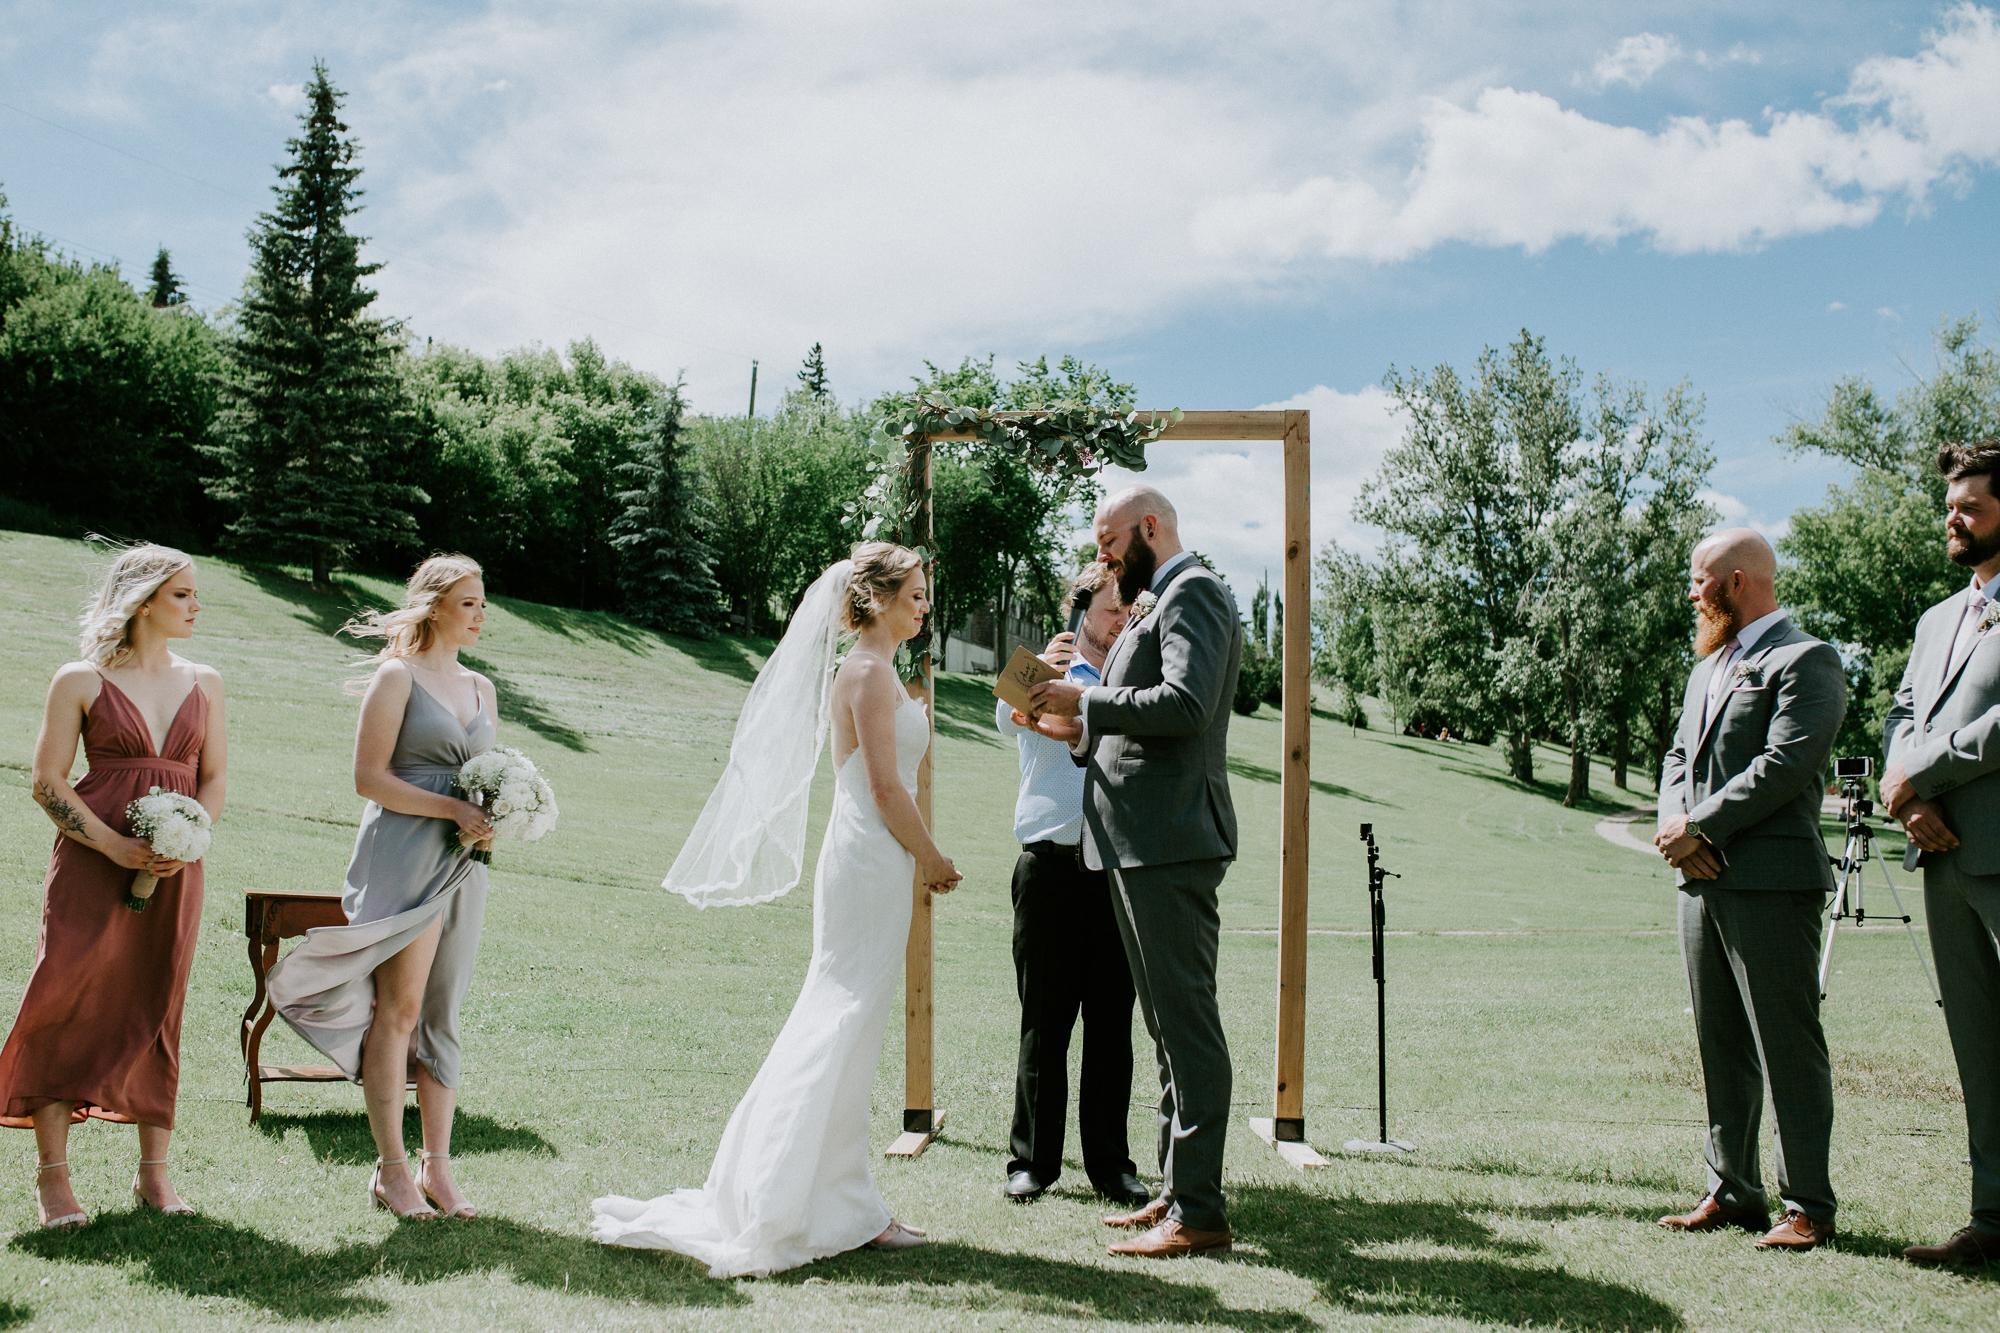 Calgary-wedding-photographer-am-46.jpg